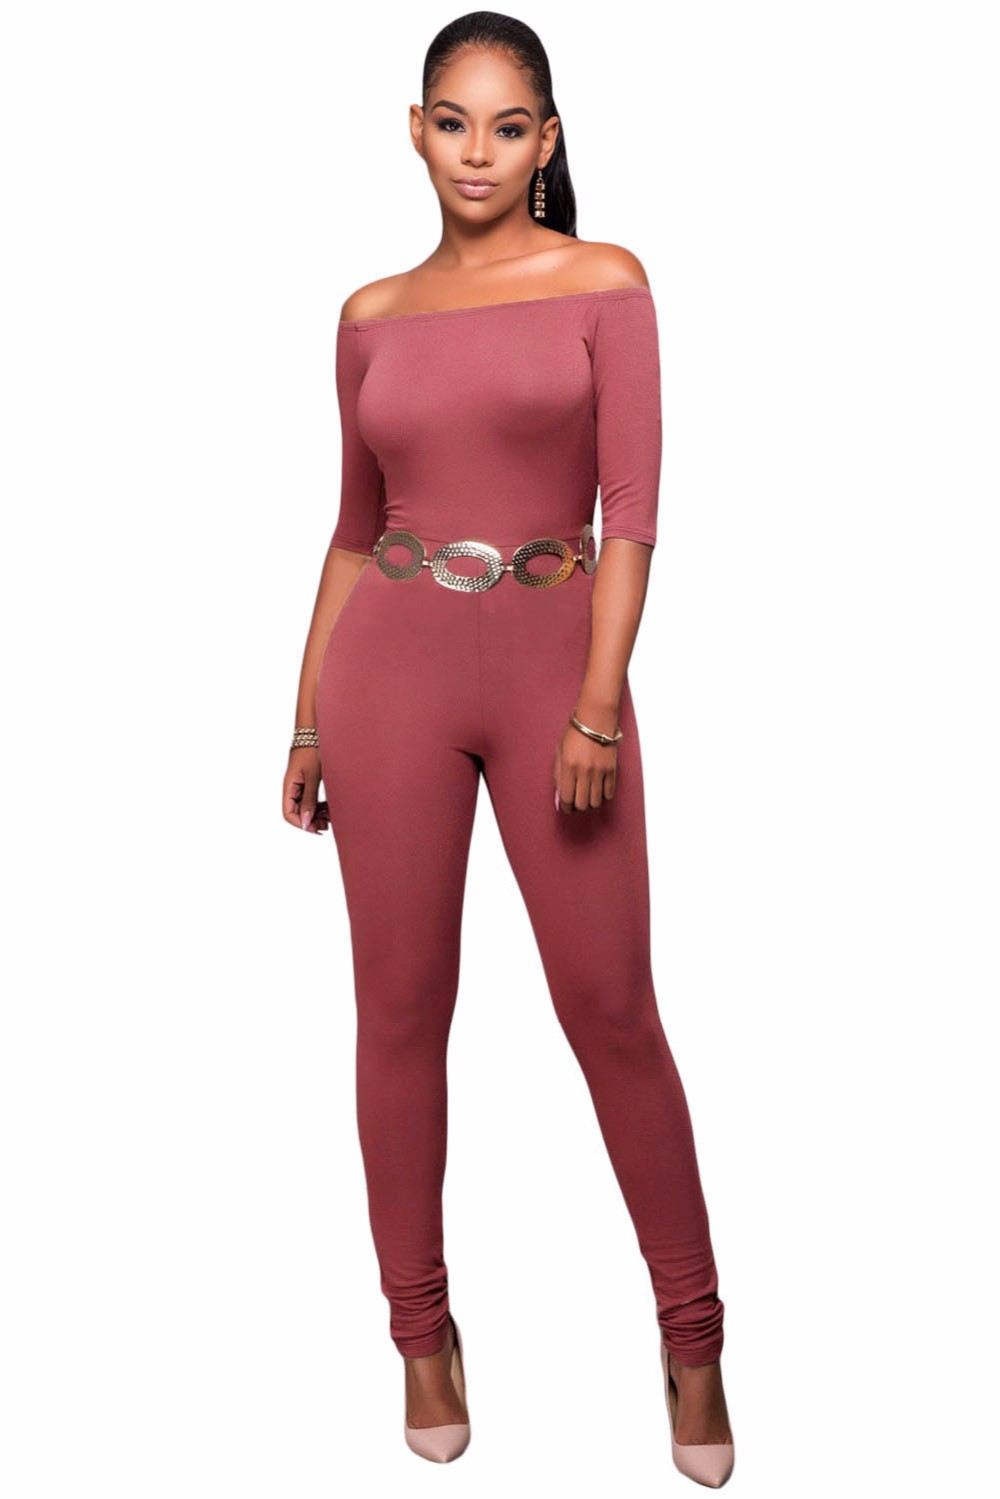 Rosy-Bardot-Neckline-Fashion-Jumpsuit-LC64193-6-2